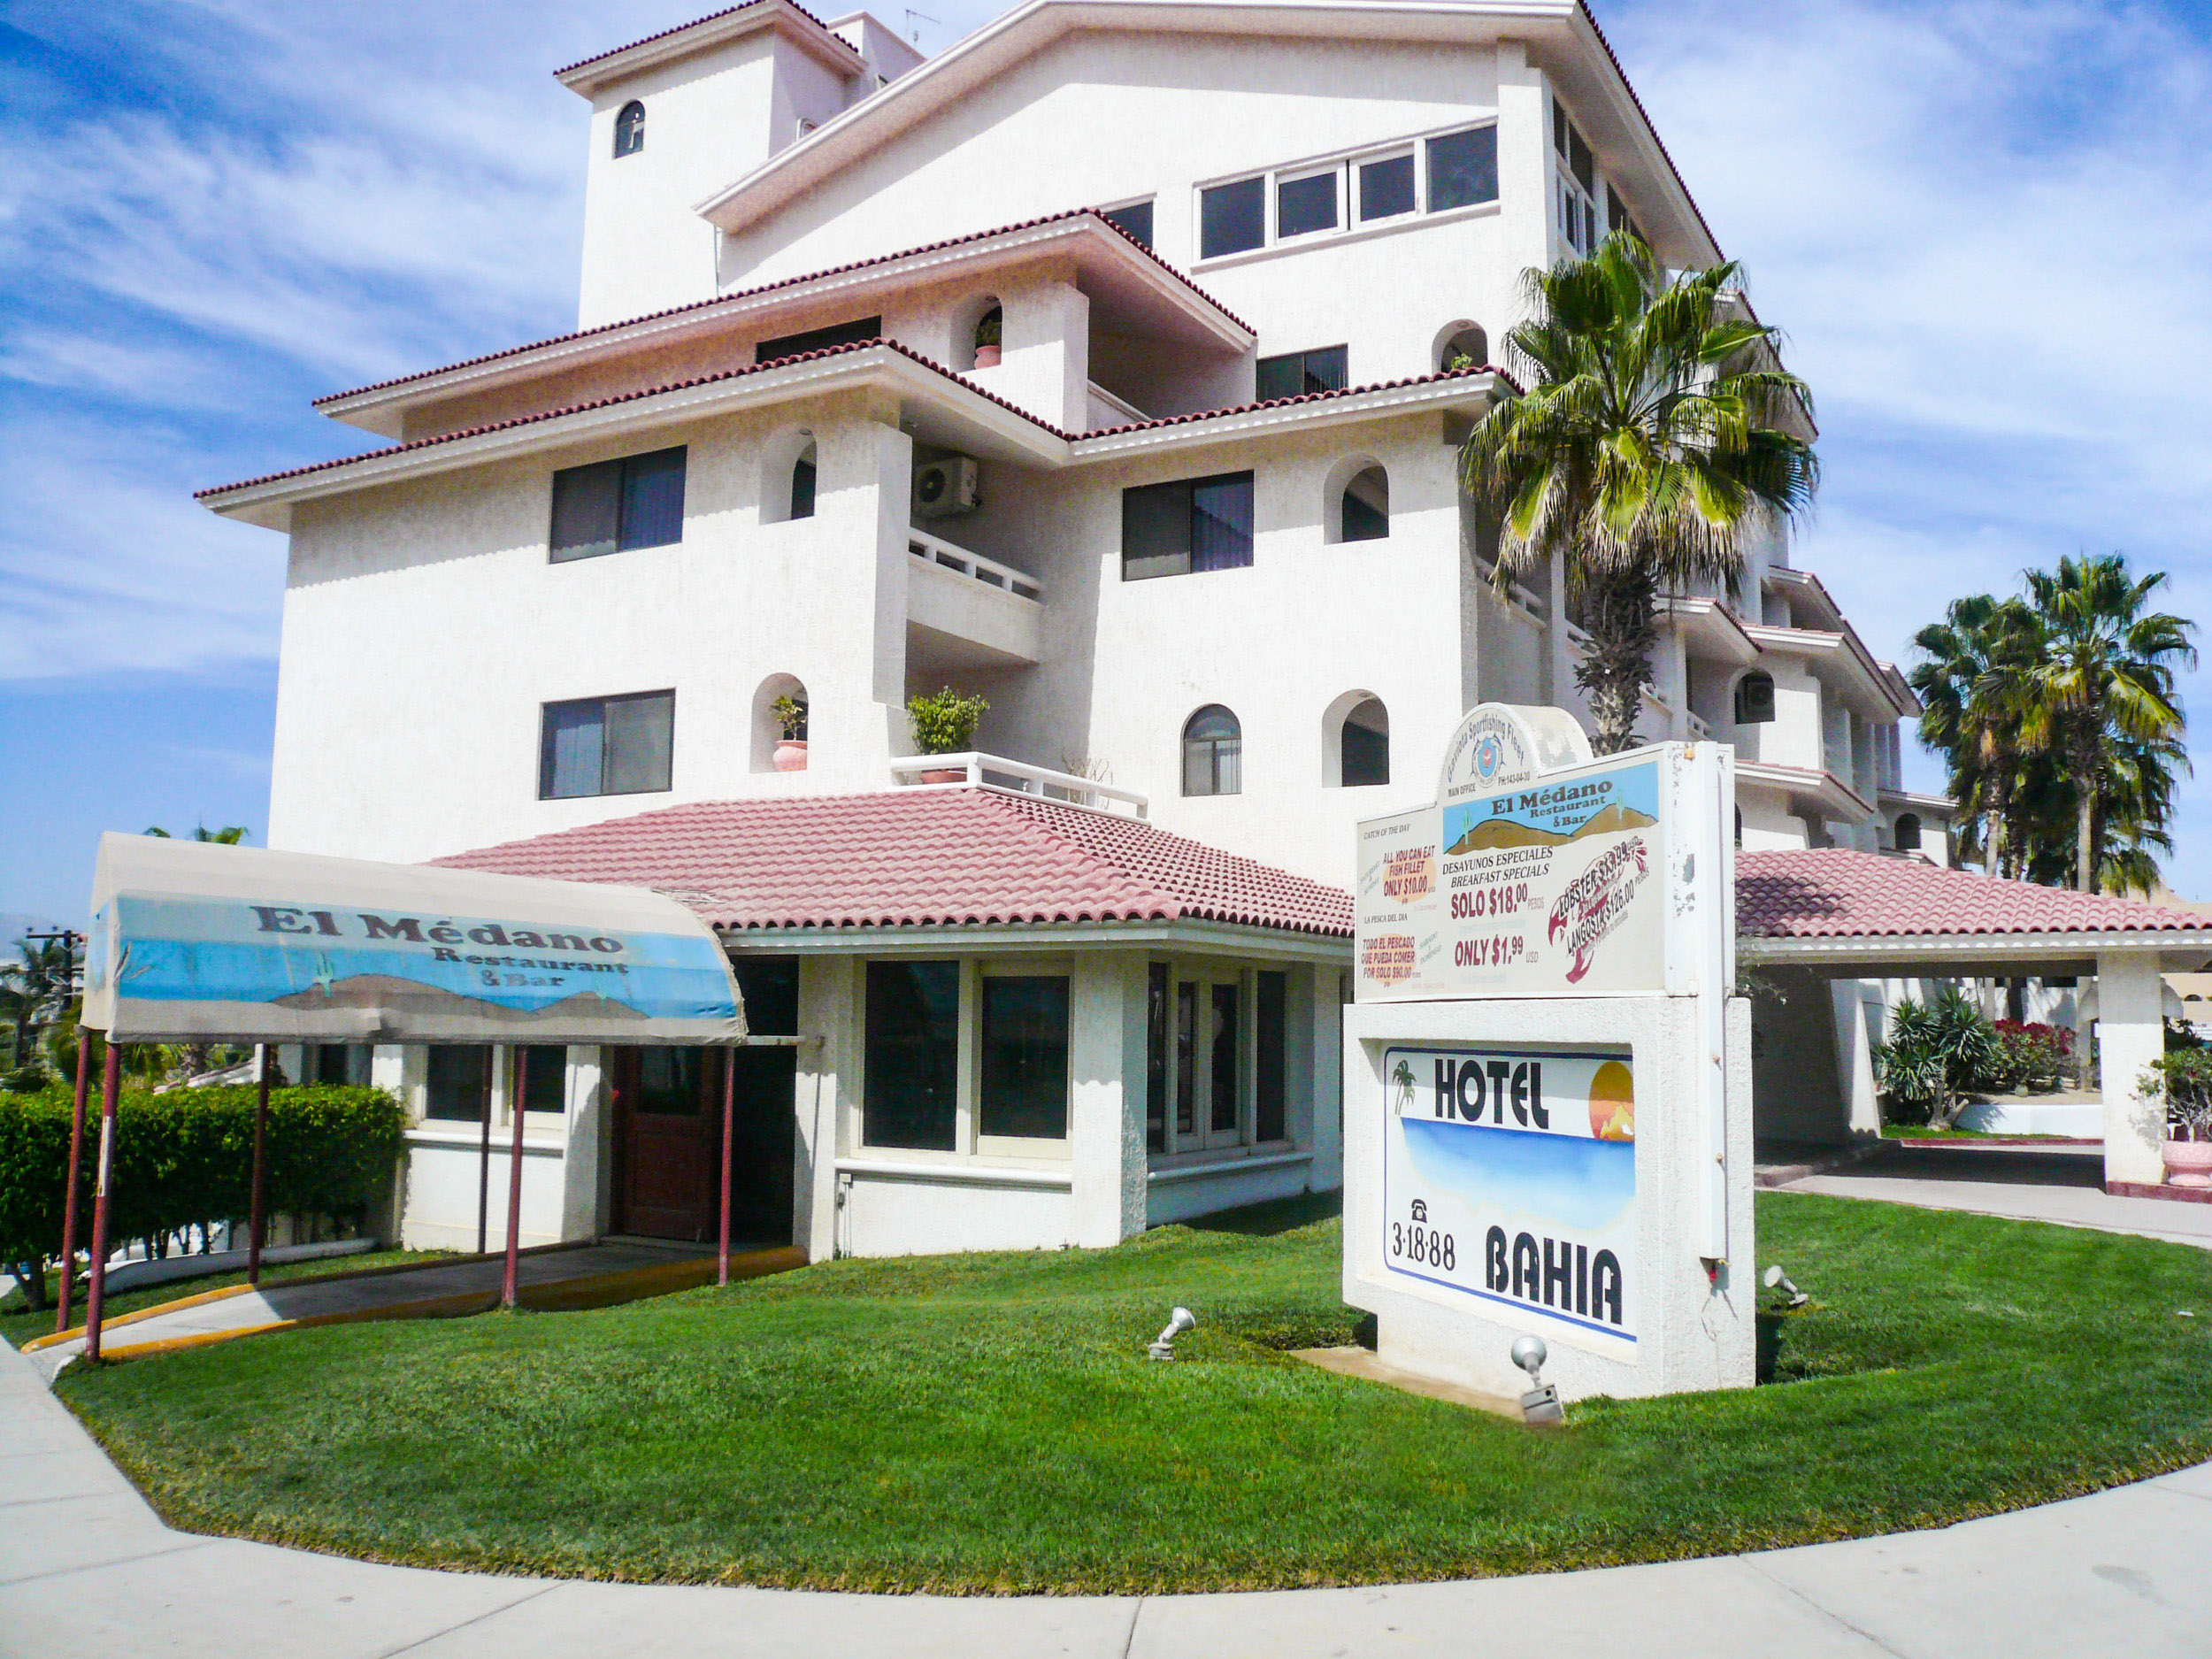 Bahia Hotel - 2007